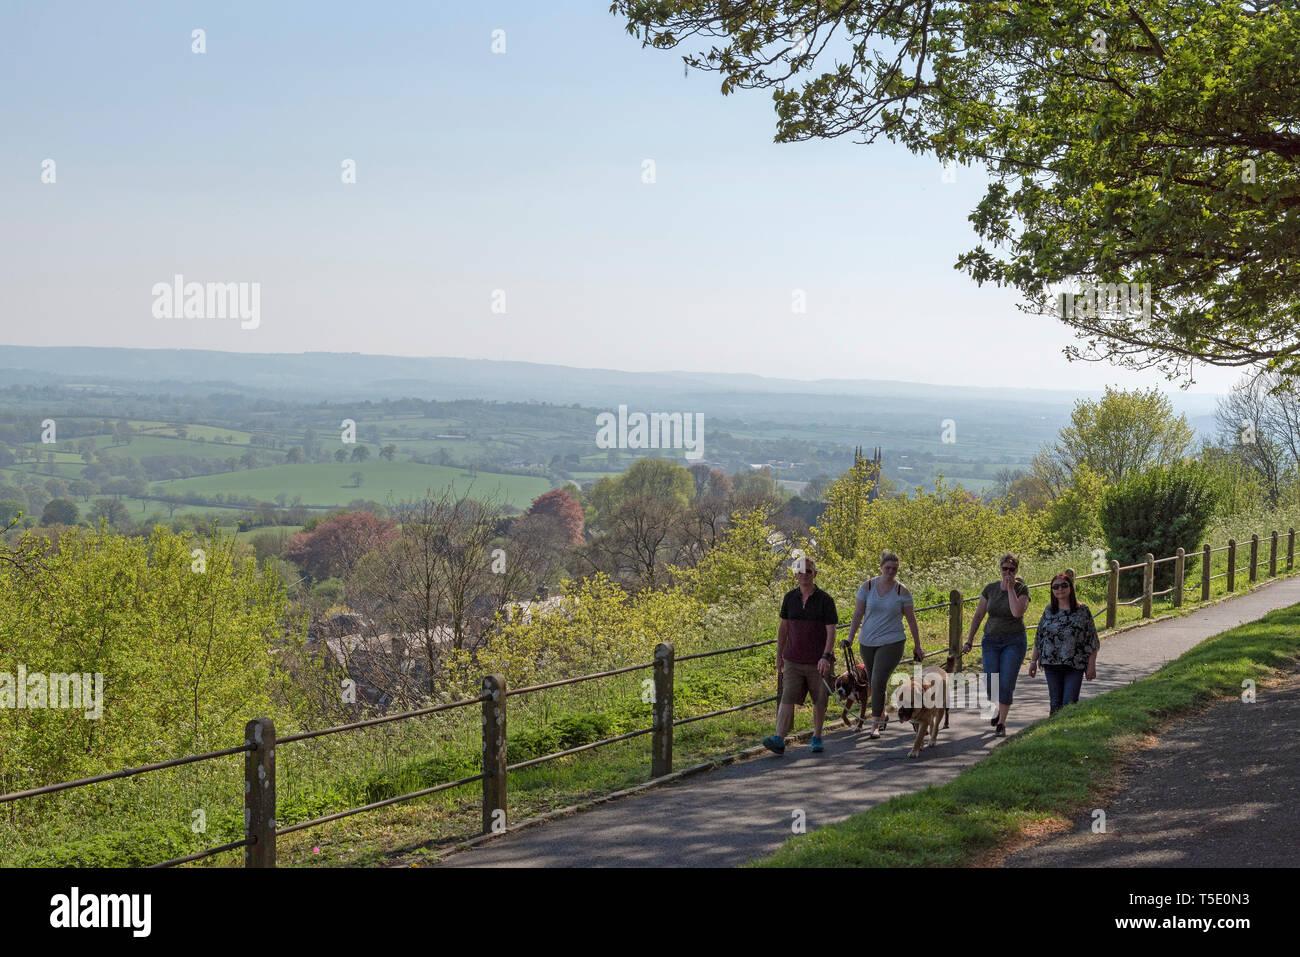 Shaftesbury, Dorset, England, UK. April 2019. Dog walkers on The Shaftesbury Heritage Trail. - Stock Image